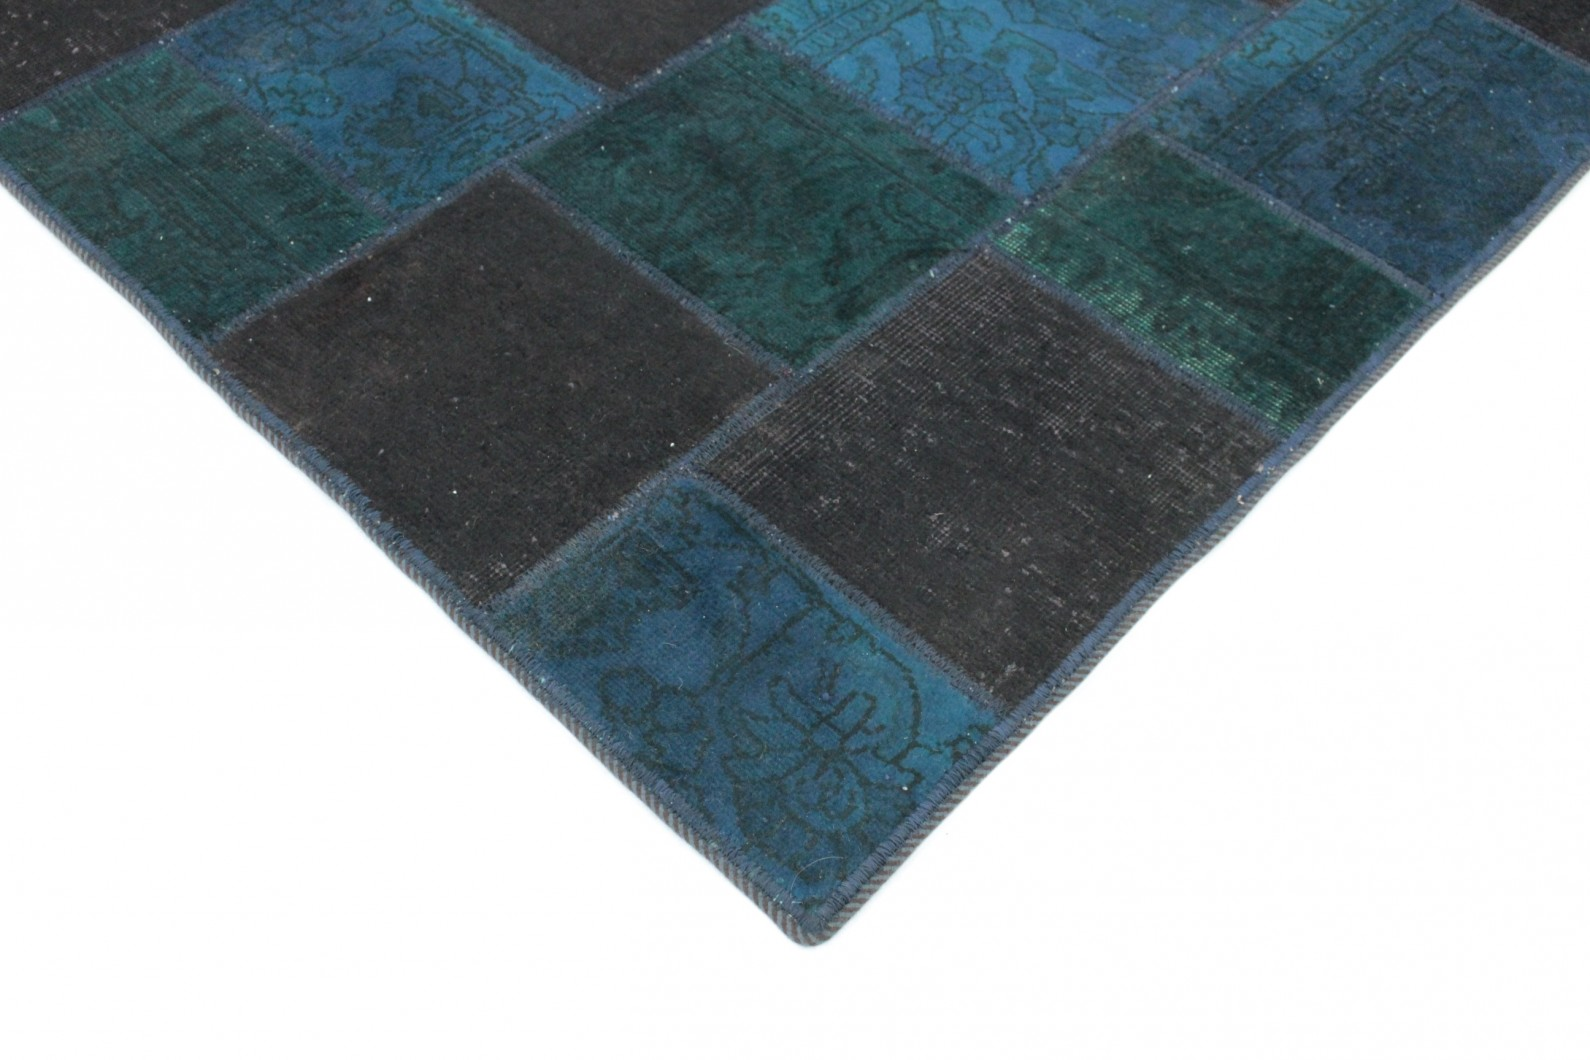 patchwork teppich blau t rkis braun in 200x150 1001. Black Bedroom Furniture Sets. Home Design Ideas